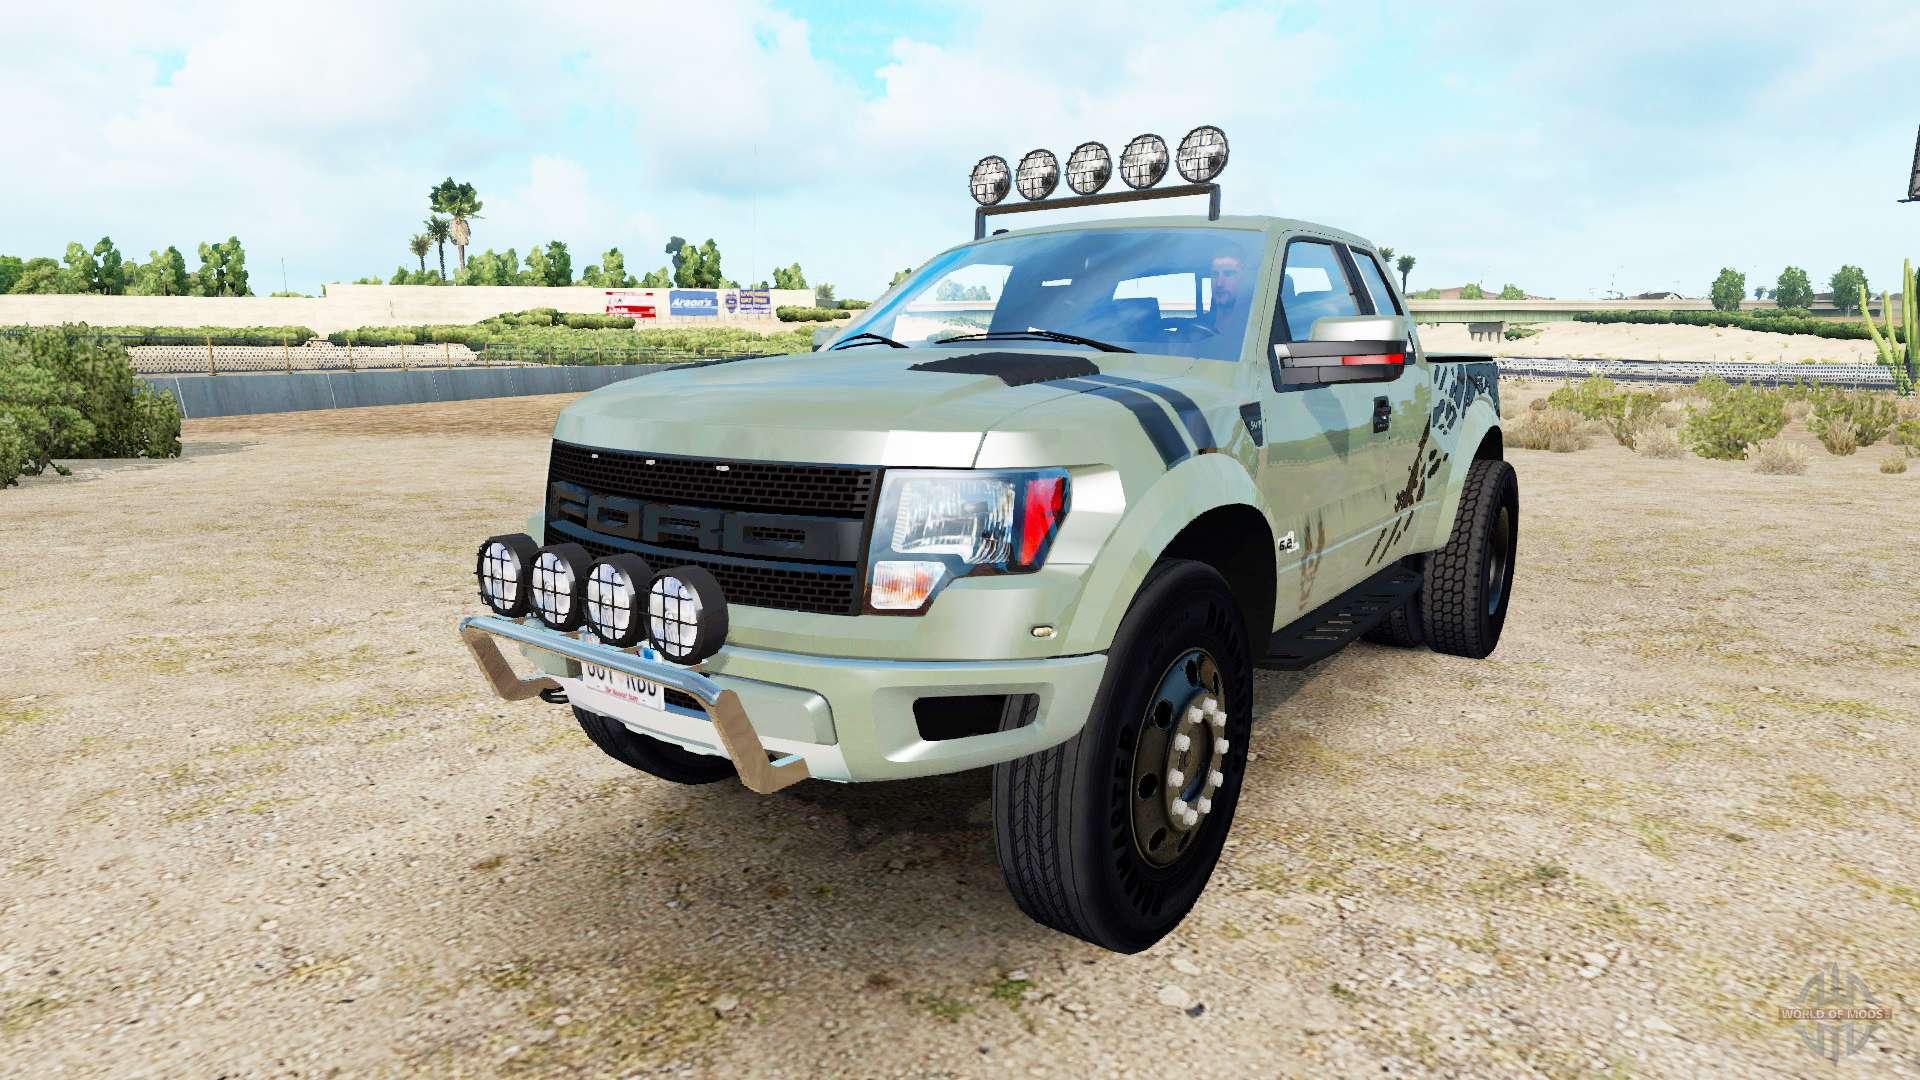 3fd8a43480 Ford F-150 SVT Raptor v1.4 for American Truck Simulator